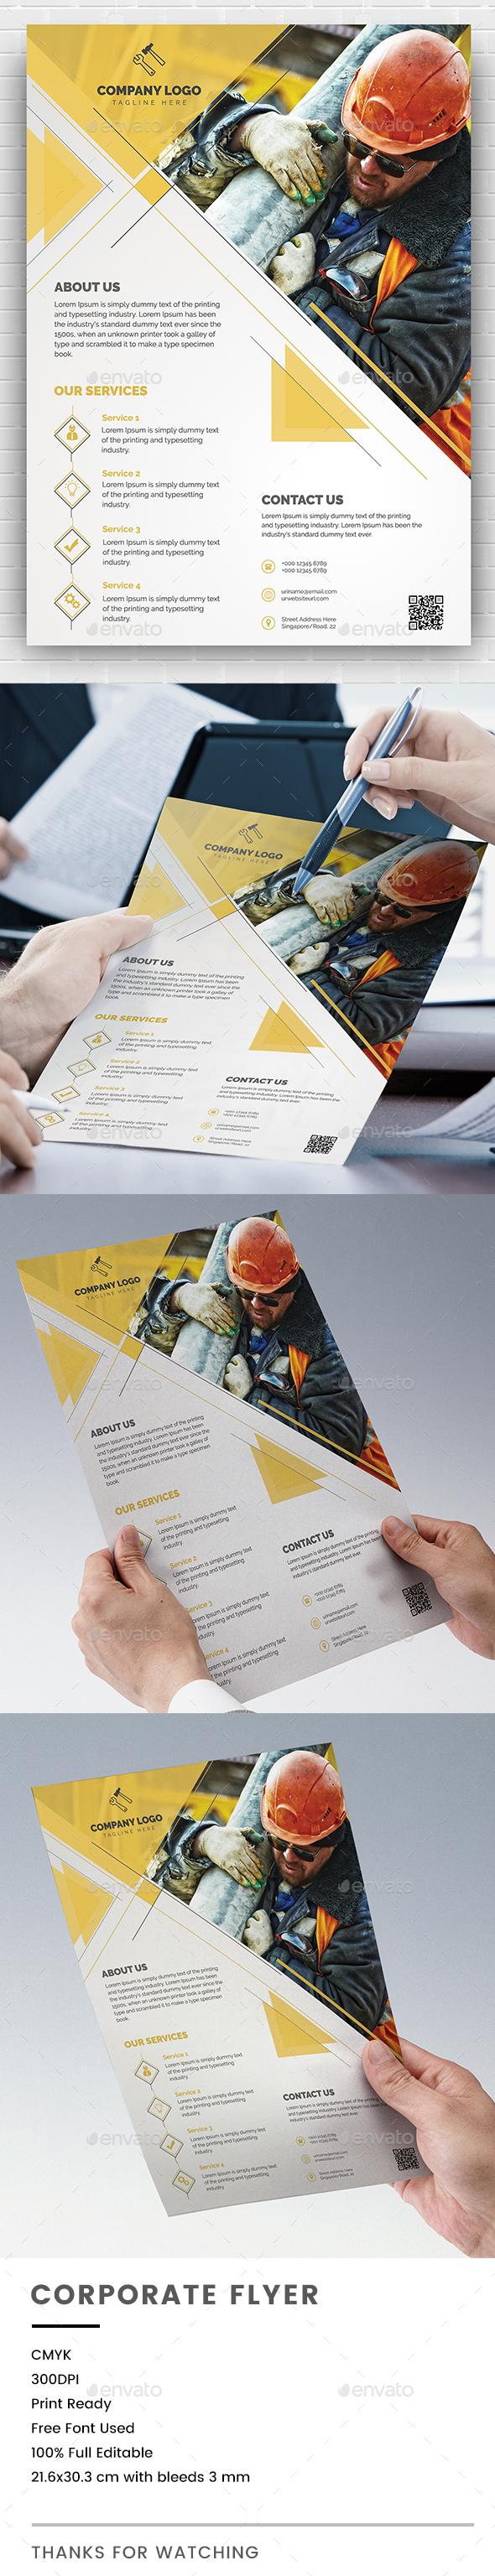 GraphicRiver Corporate Flyer 20907670